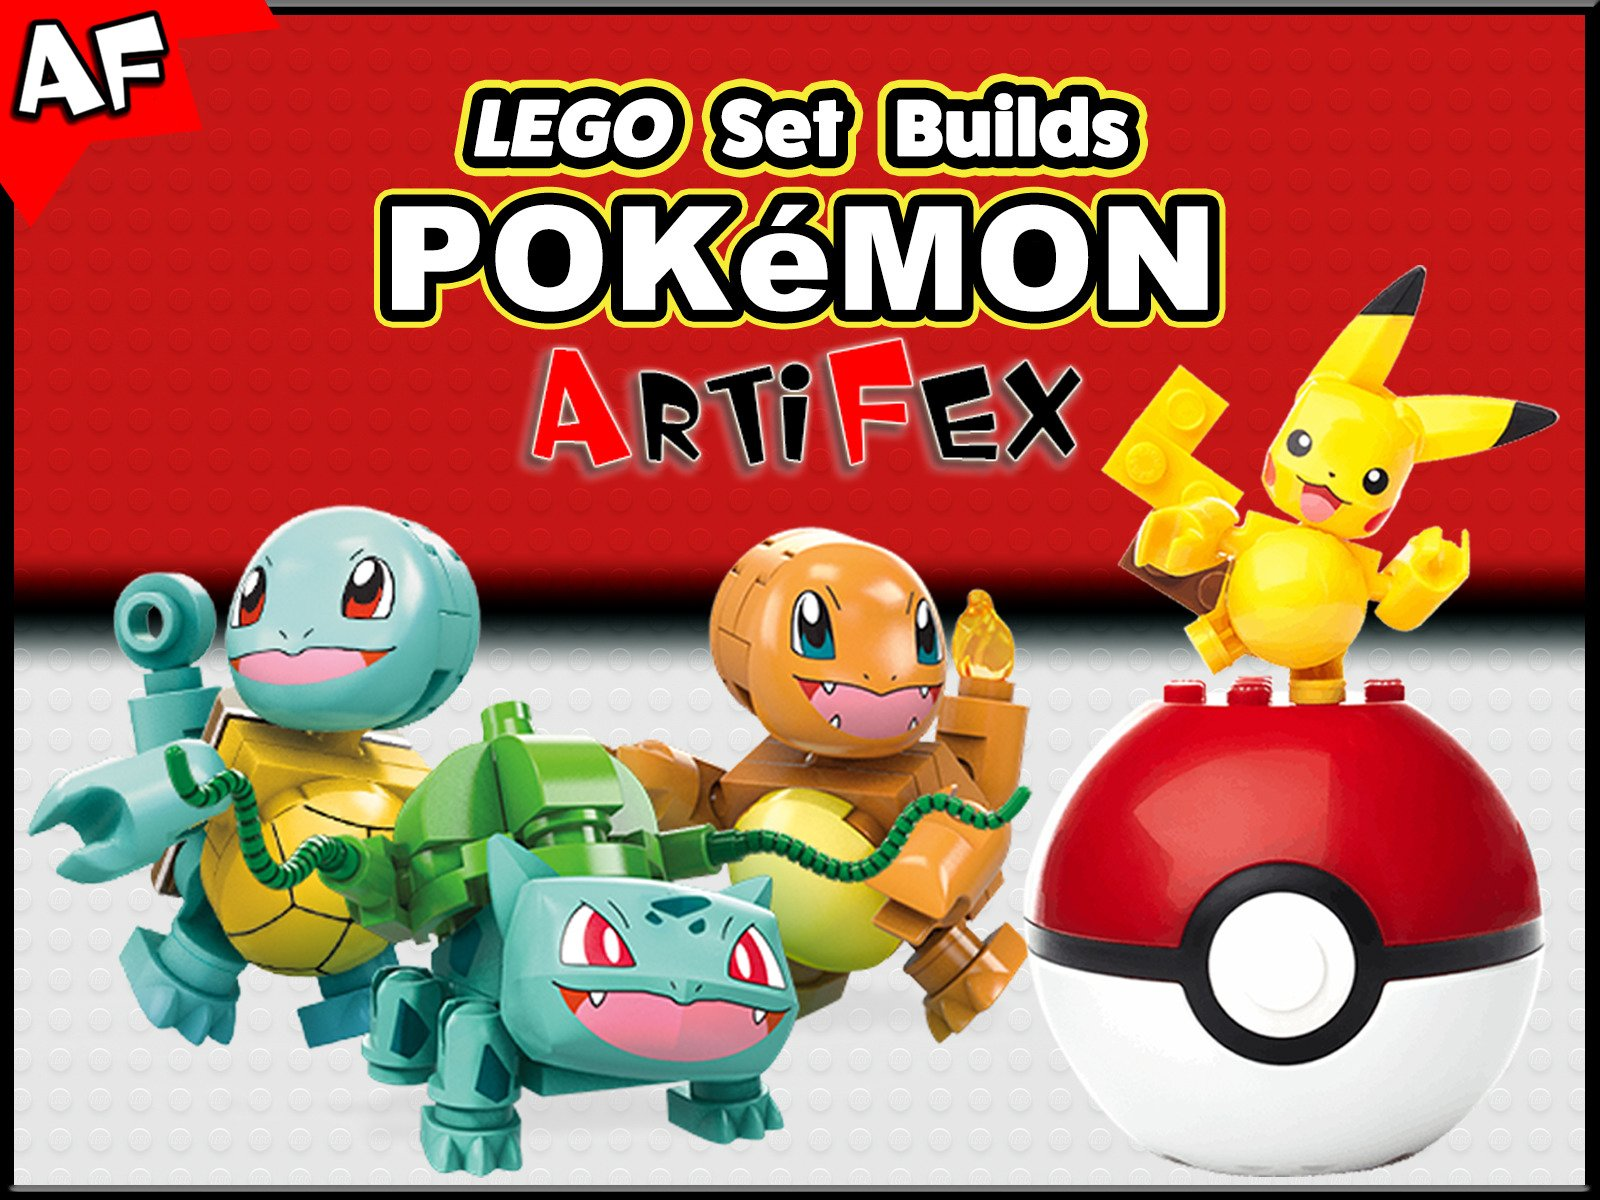 Clip: Lego Set Builds Pokémon - Season 1